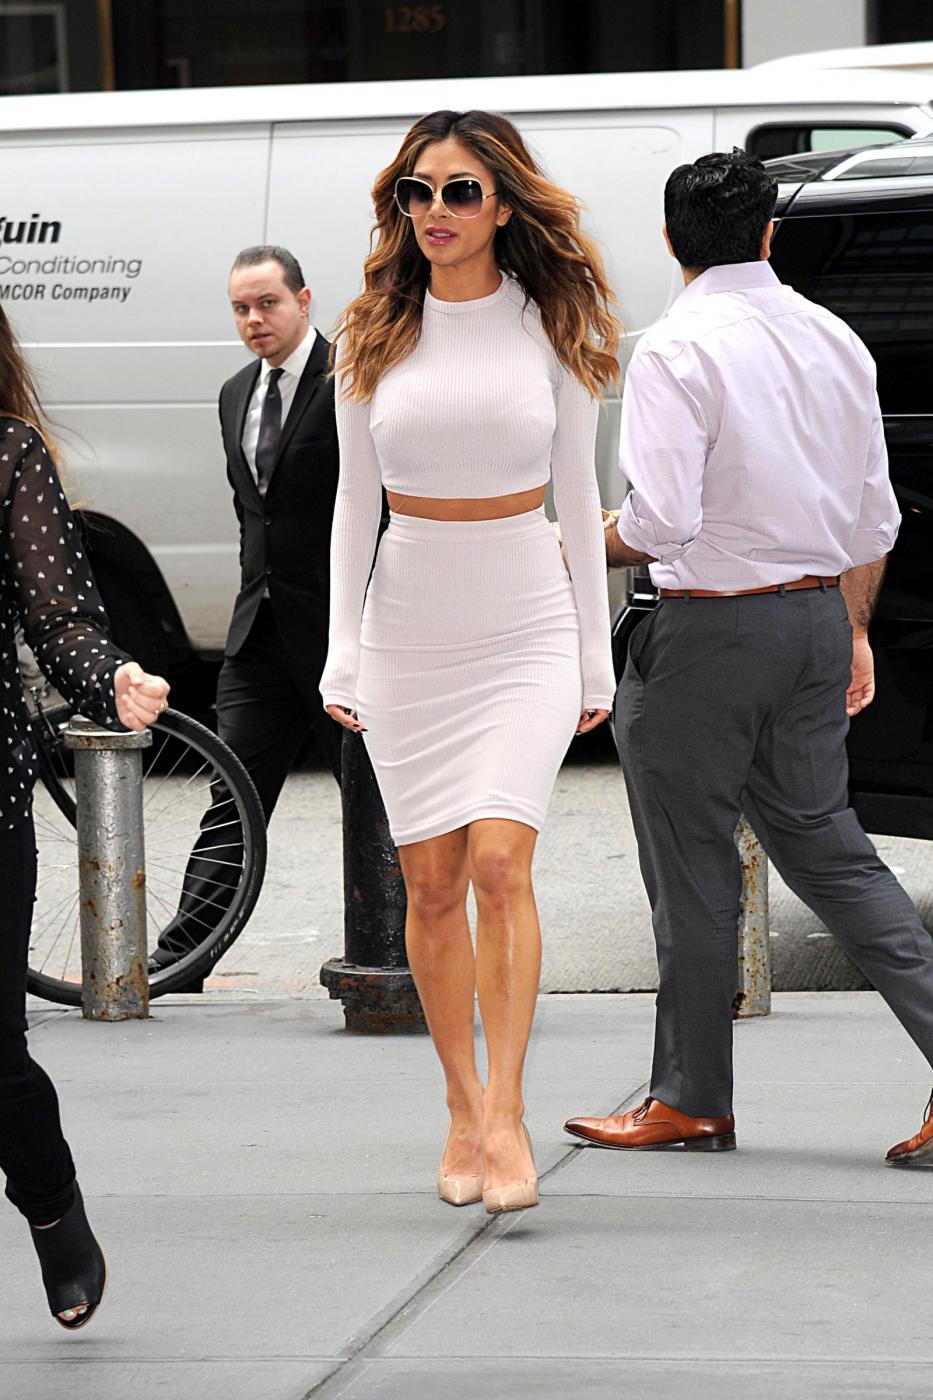 Nicole Scherzinger sempre più curvy e...bionda. Abiti super aderenti a New York FOTO 6